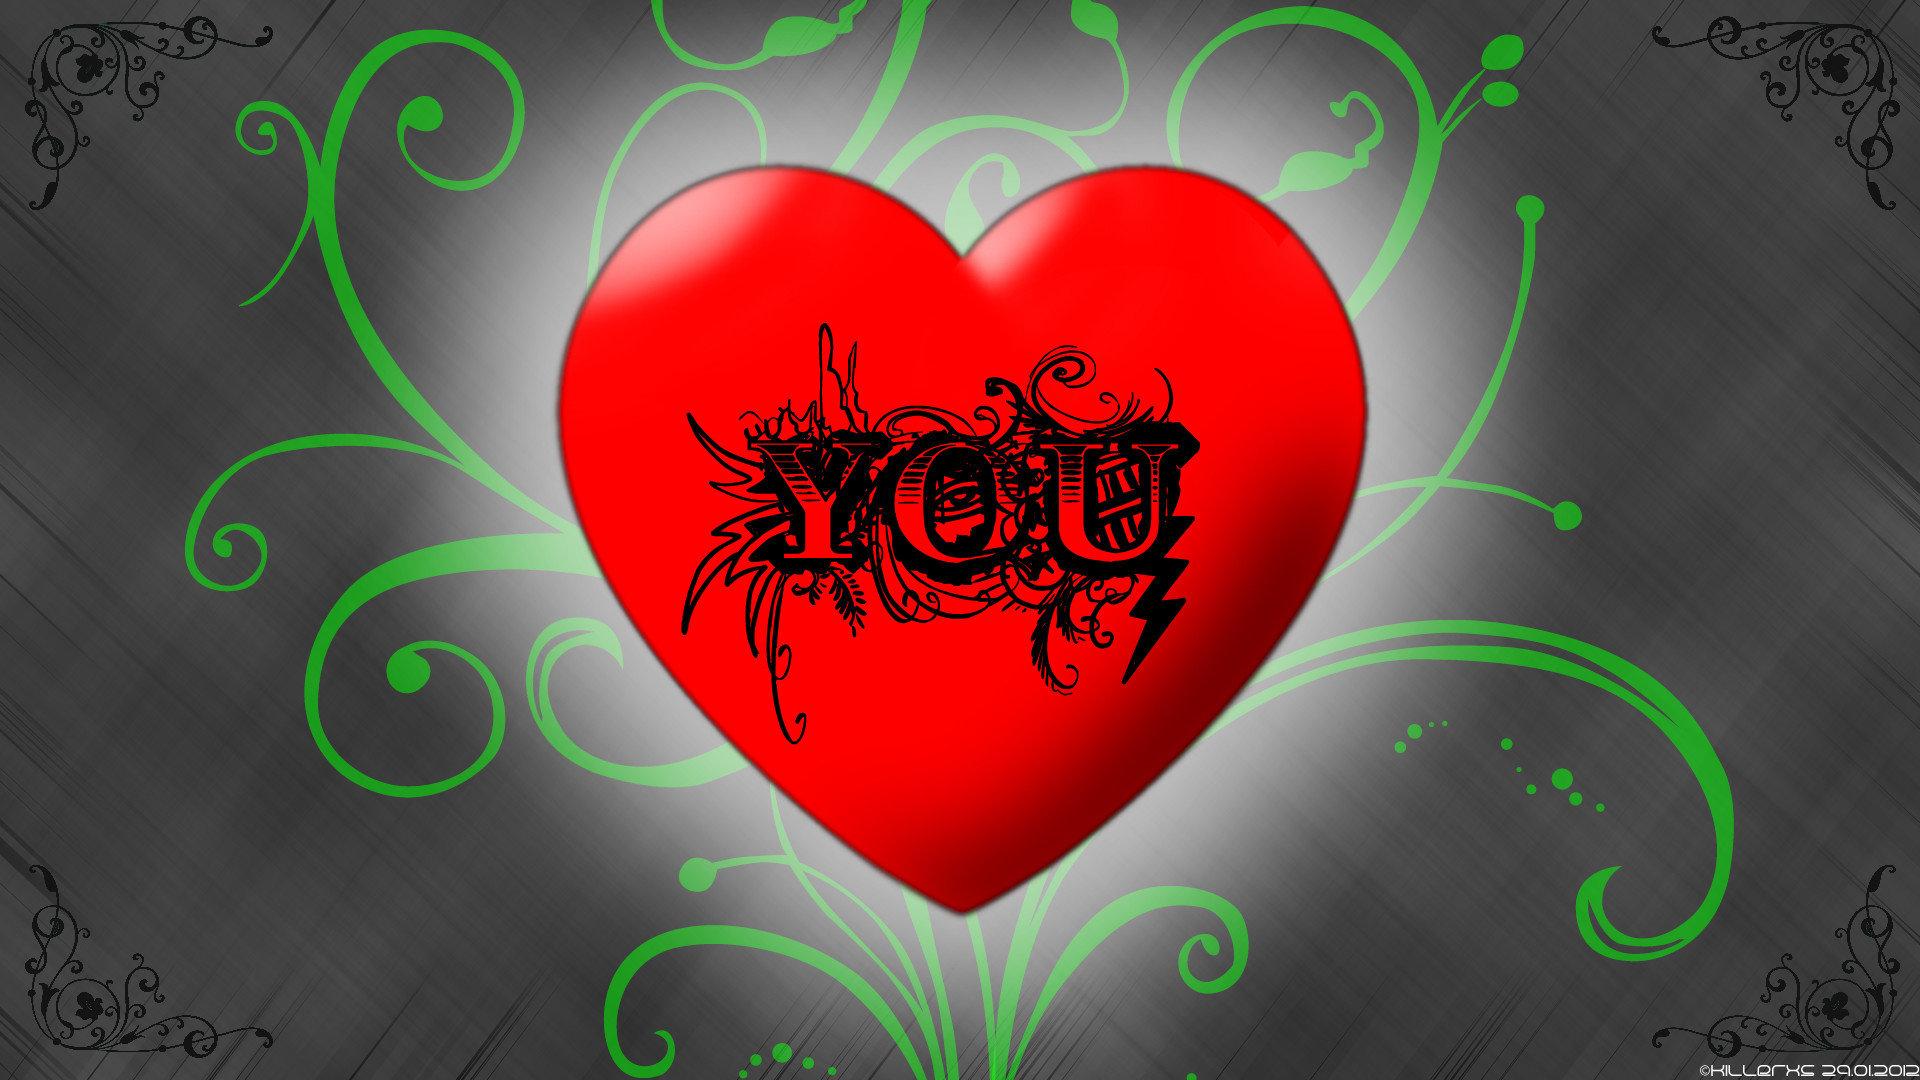 Free Download Love Wallpaper Id306596 Full Hd 1920x1080 For Pc